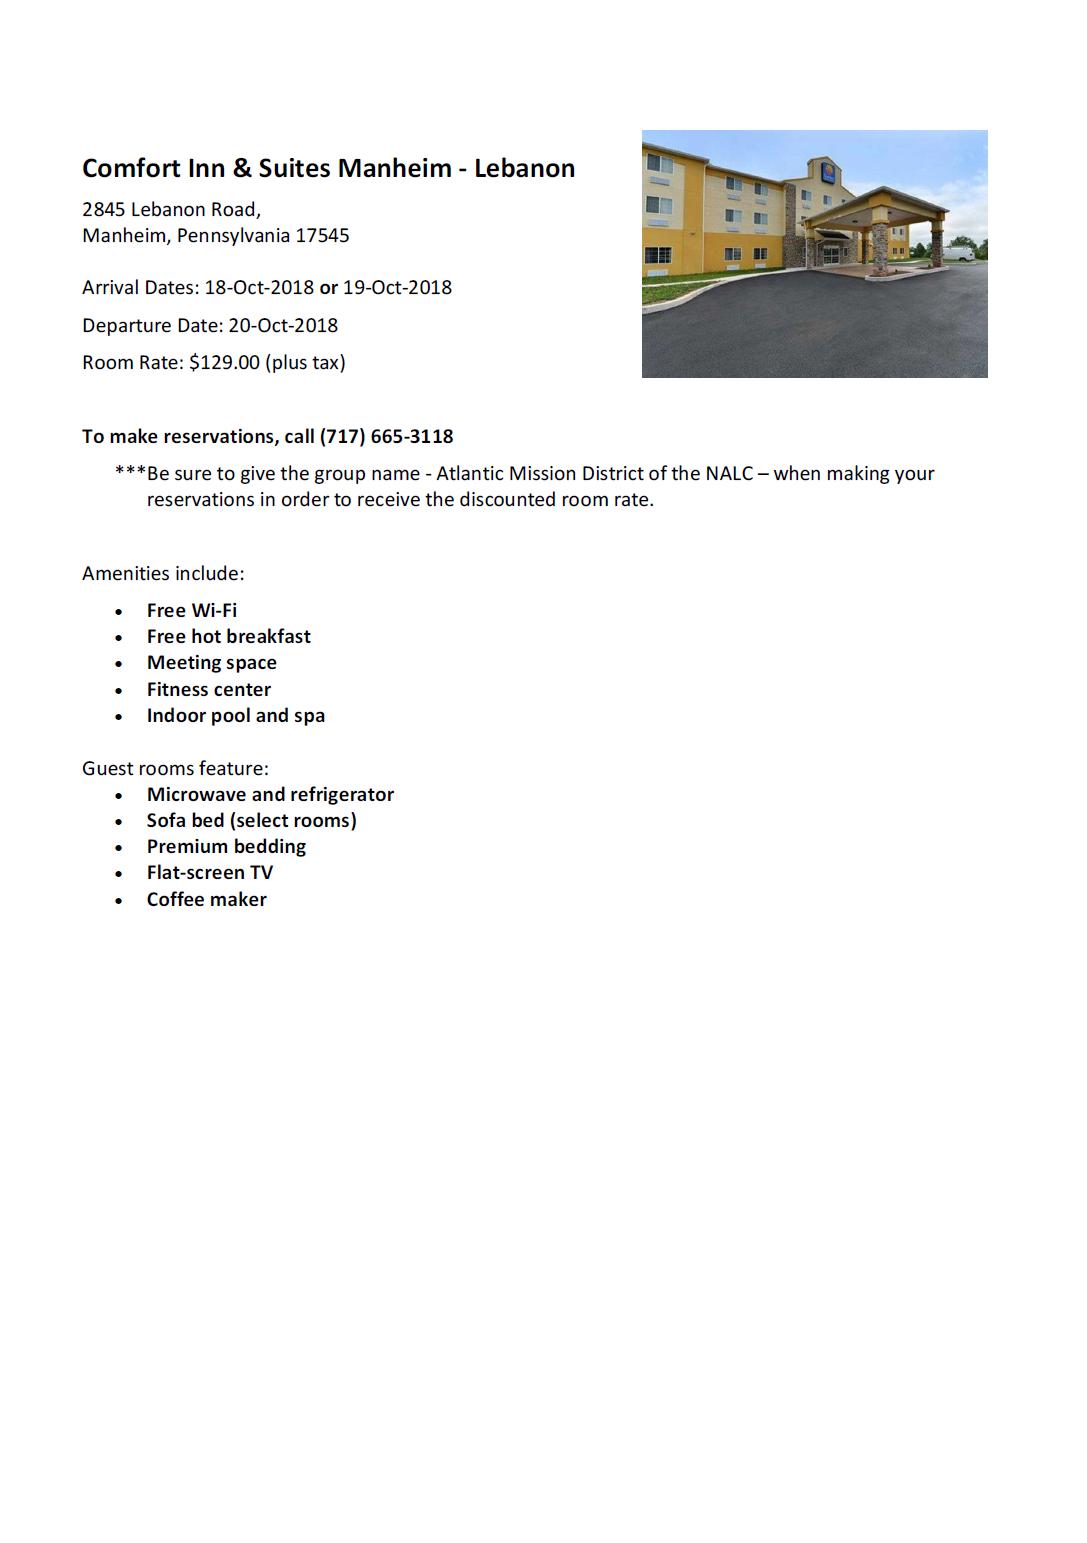 Comfort Inn & Suites Information